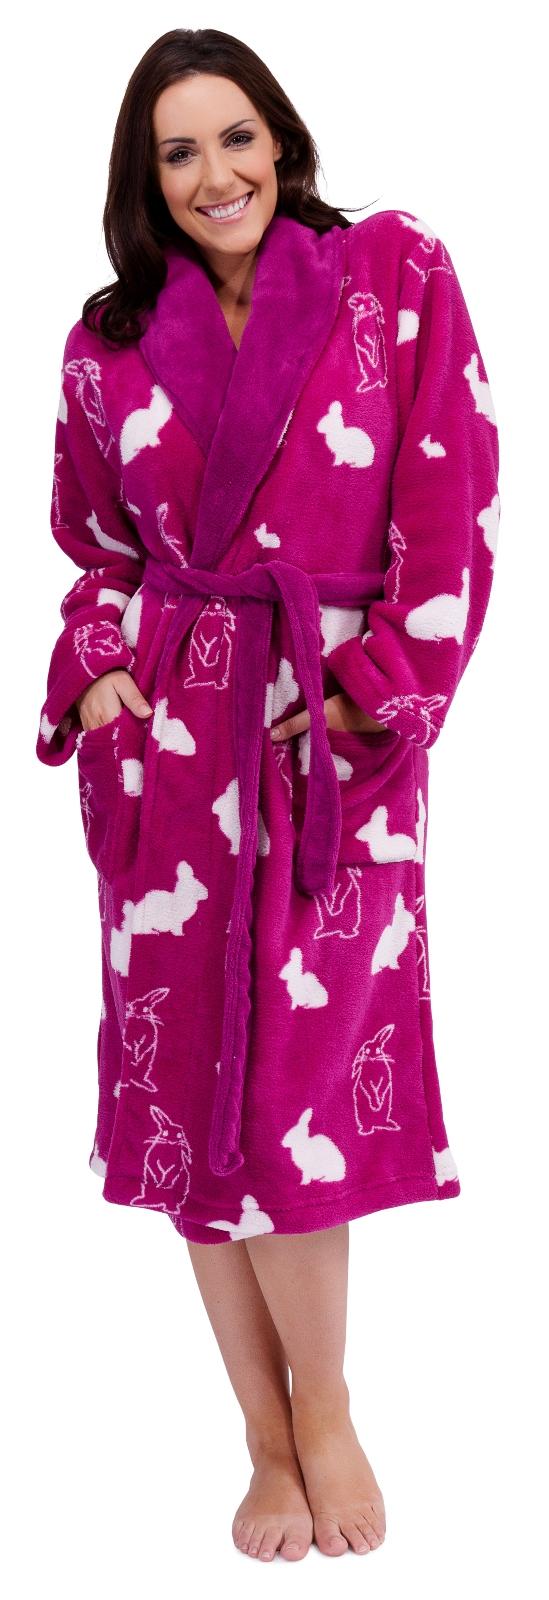 cbd4541804 WOMENS FULL LENGTH FLEECE BATH ROBE DRESSING GOWN HOUSECOAT+ BELT ...